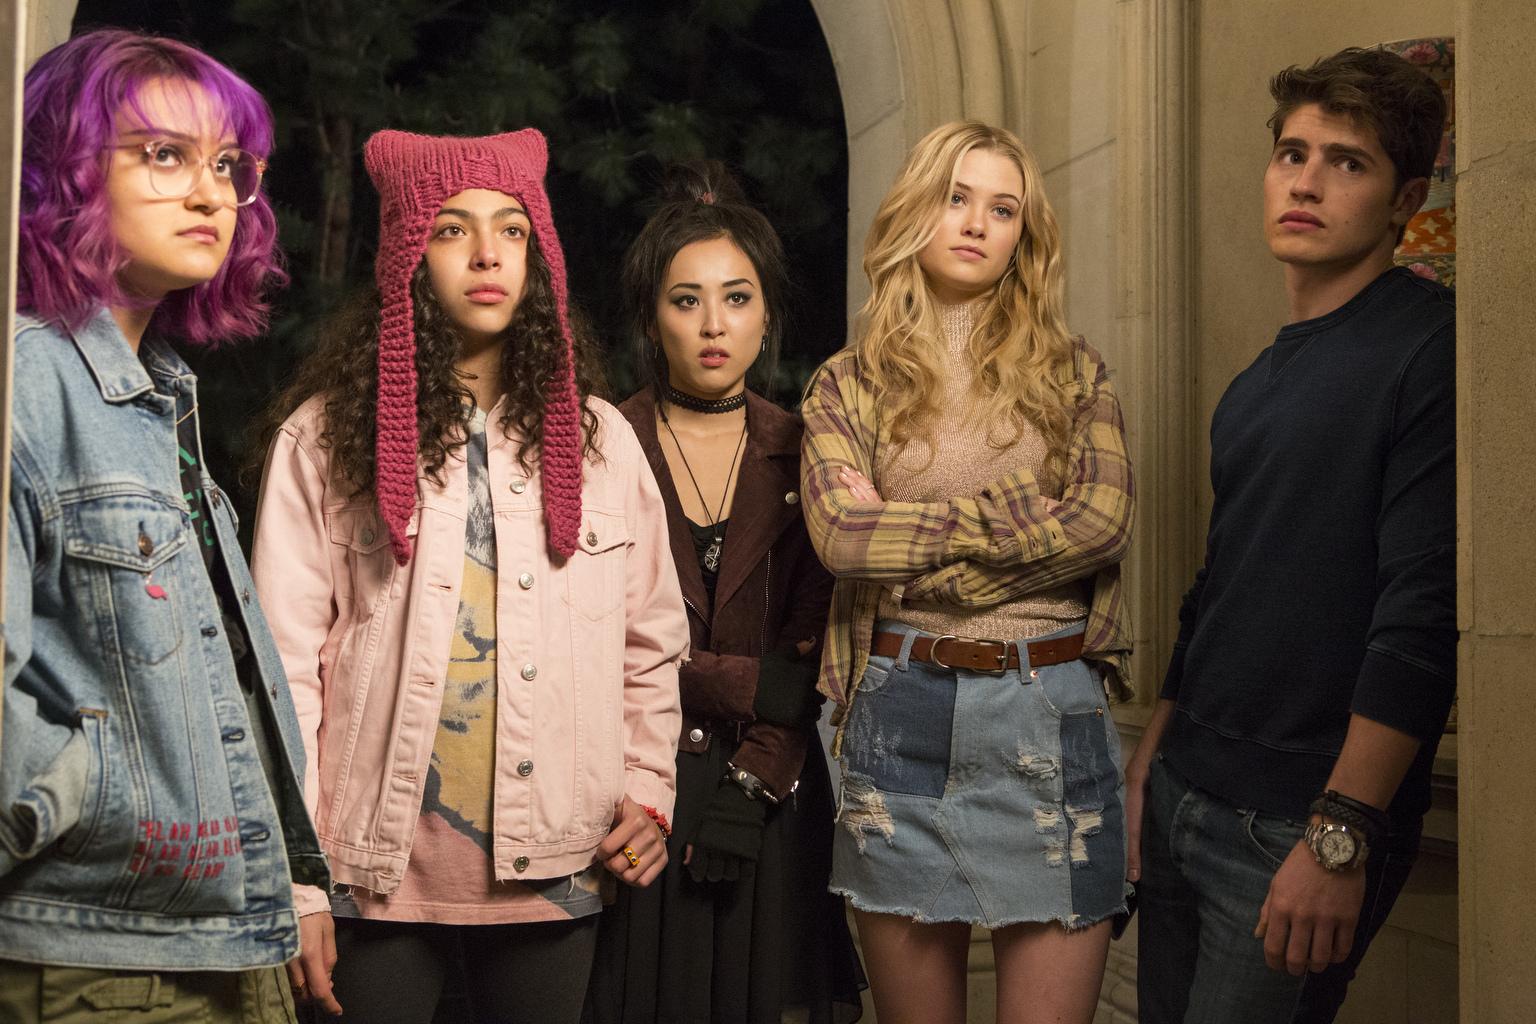 Palatable legal age teenagers